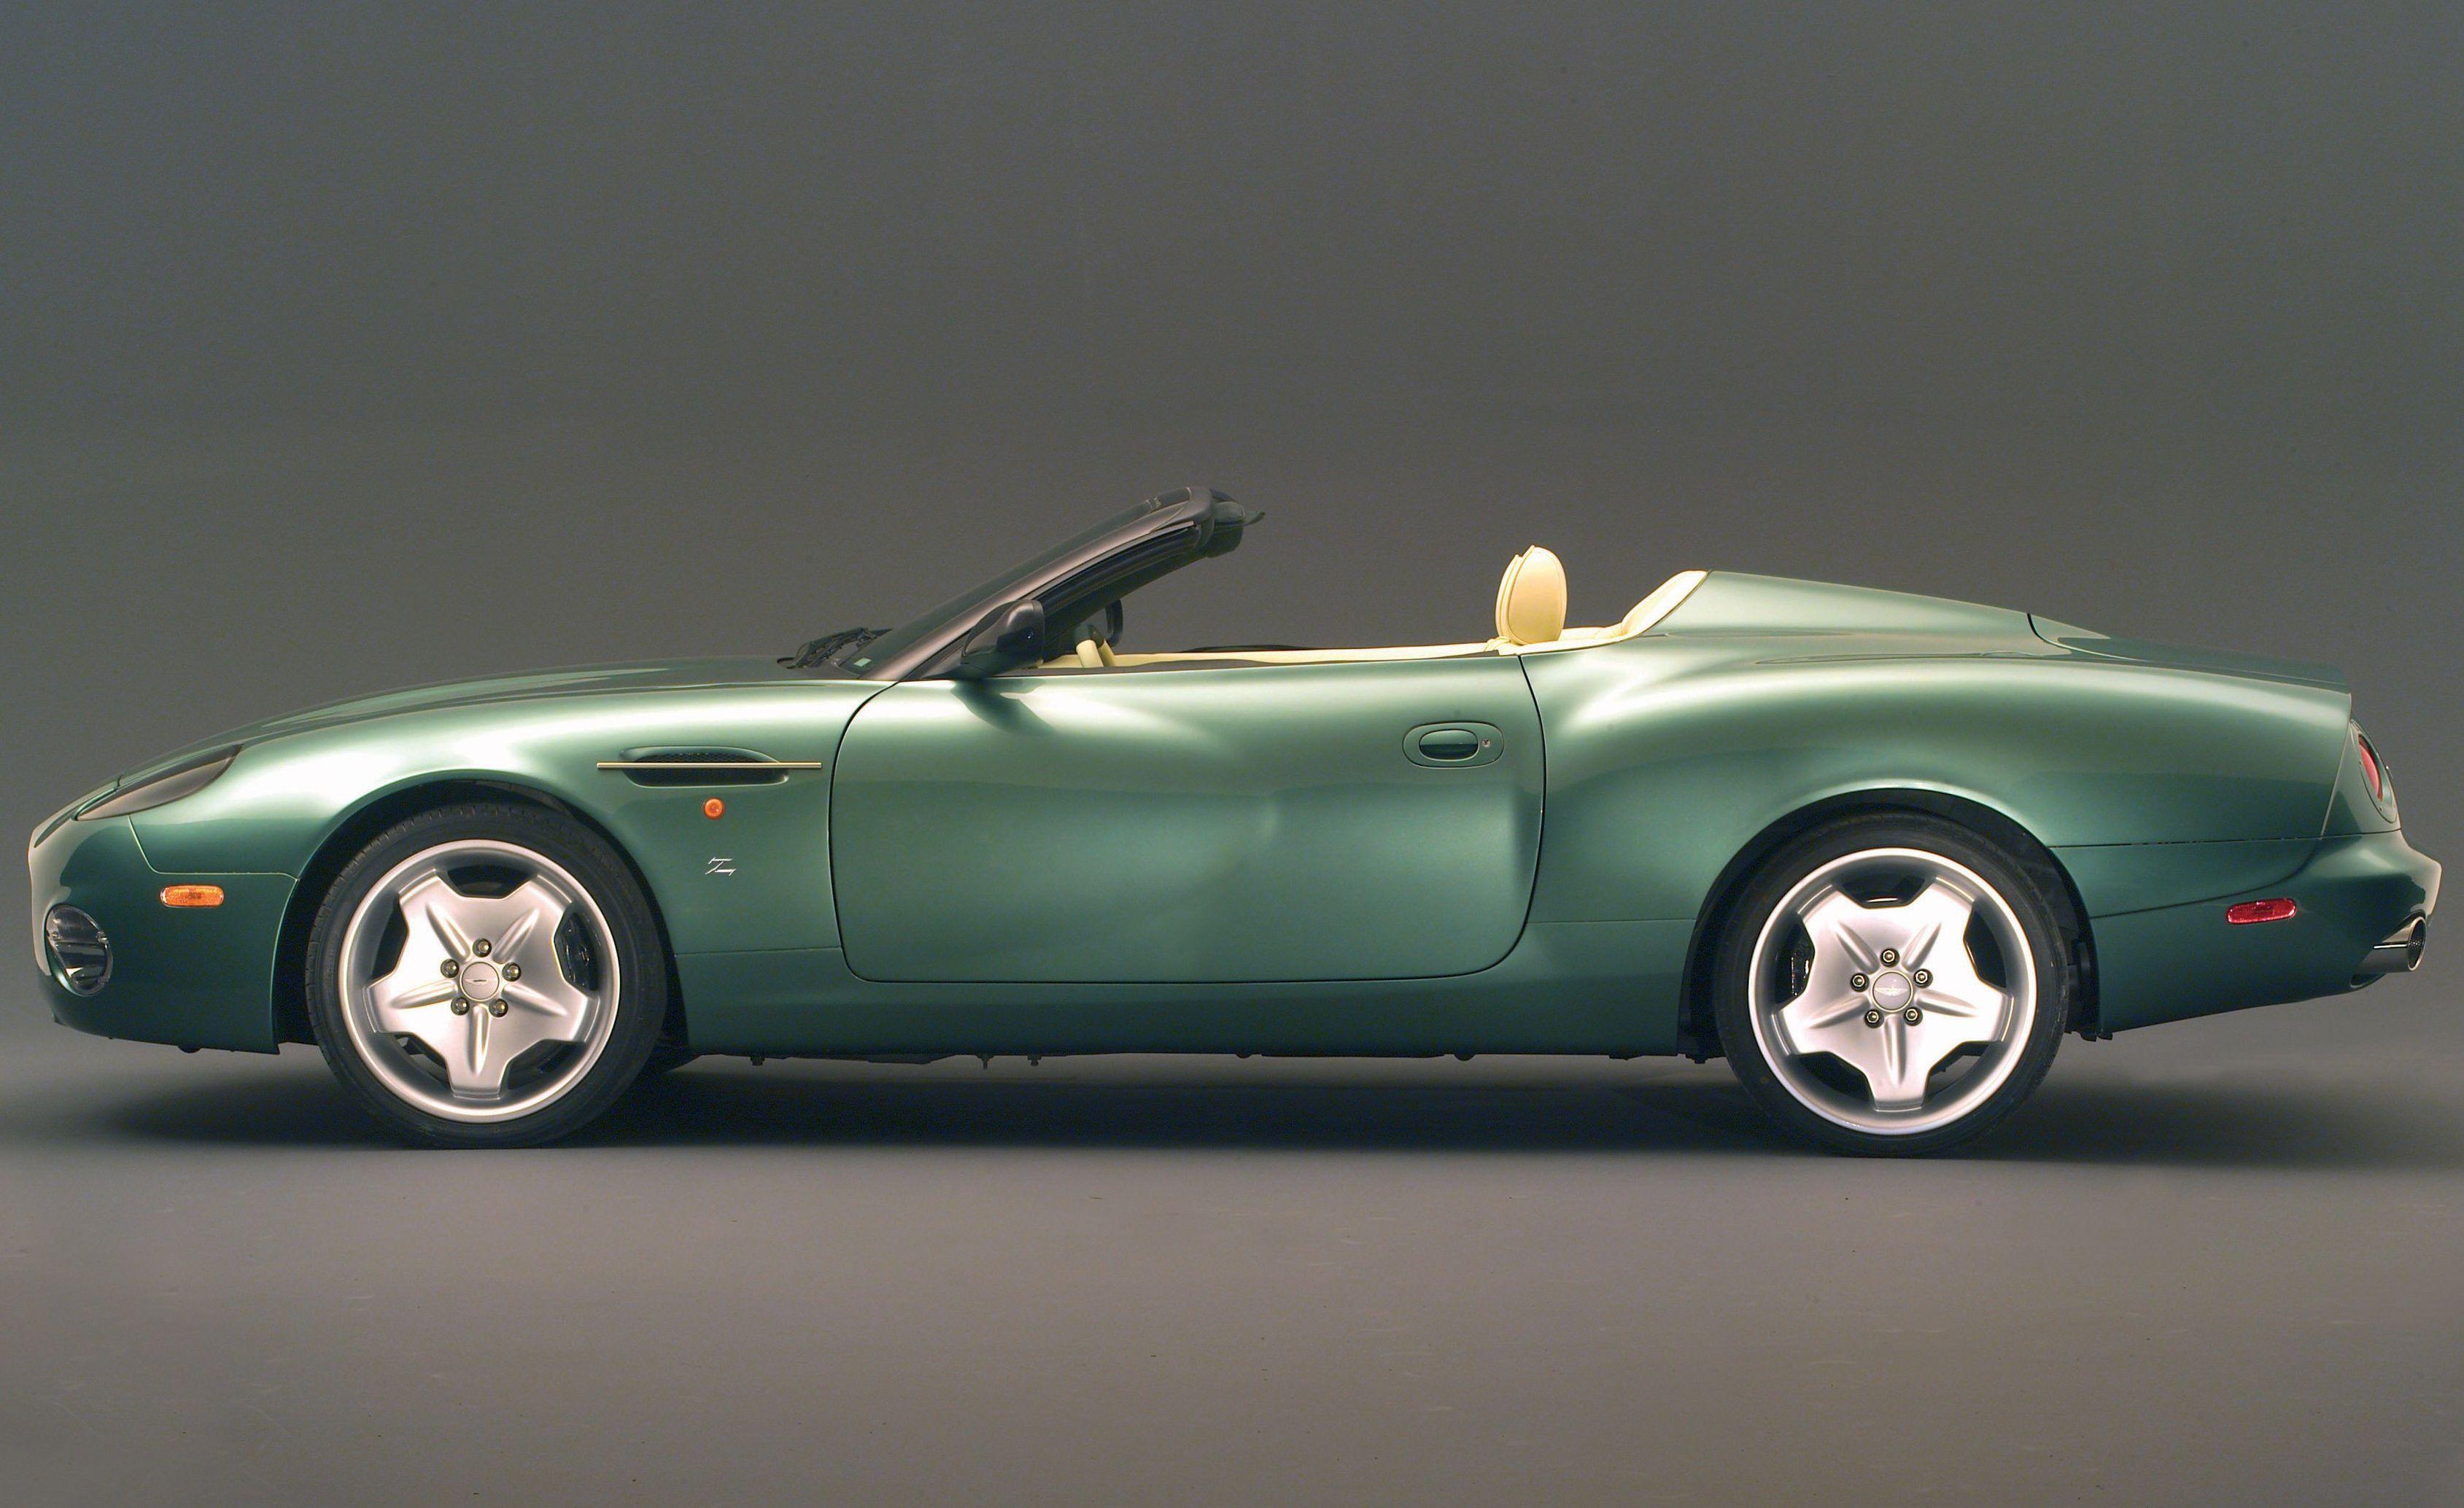 2012 Aston Martin V8 Vantage S Drive Review